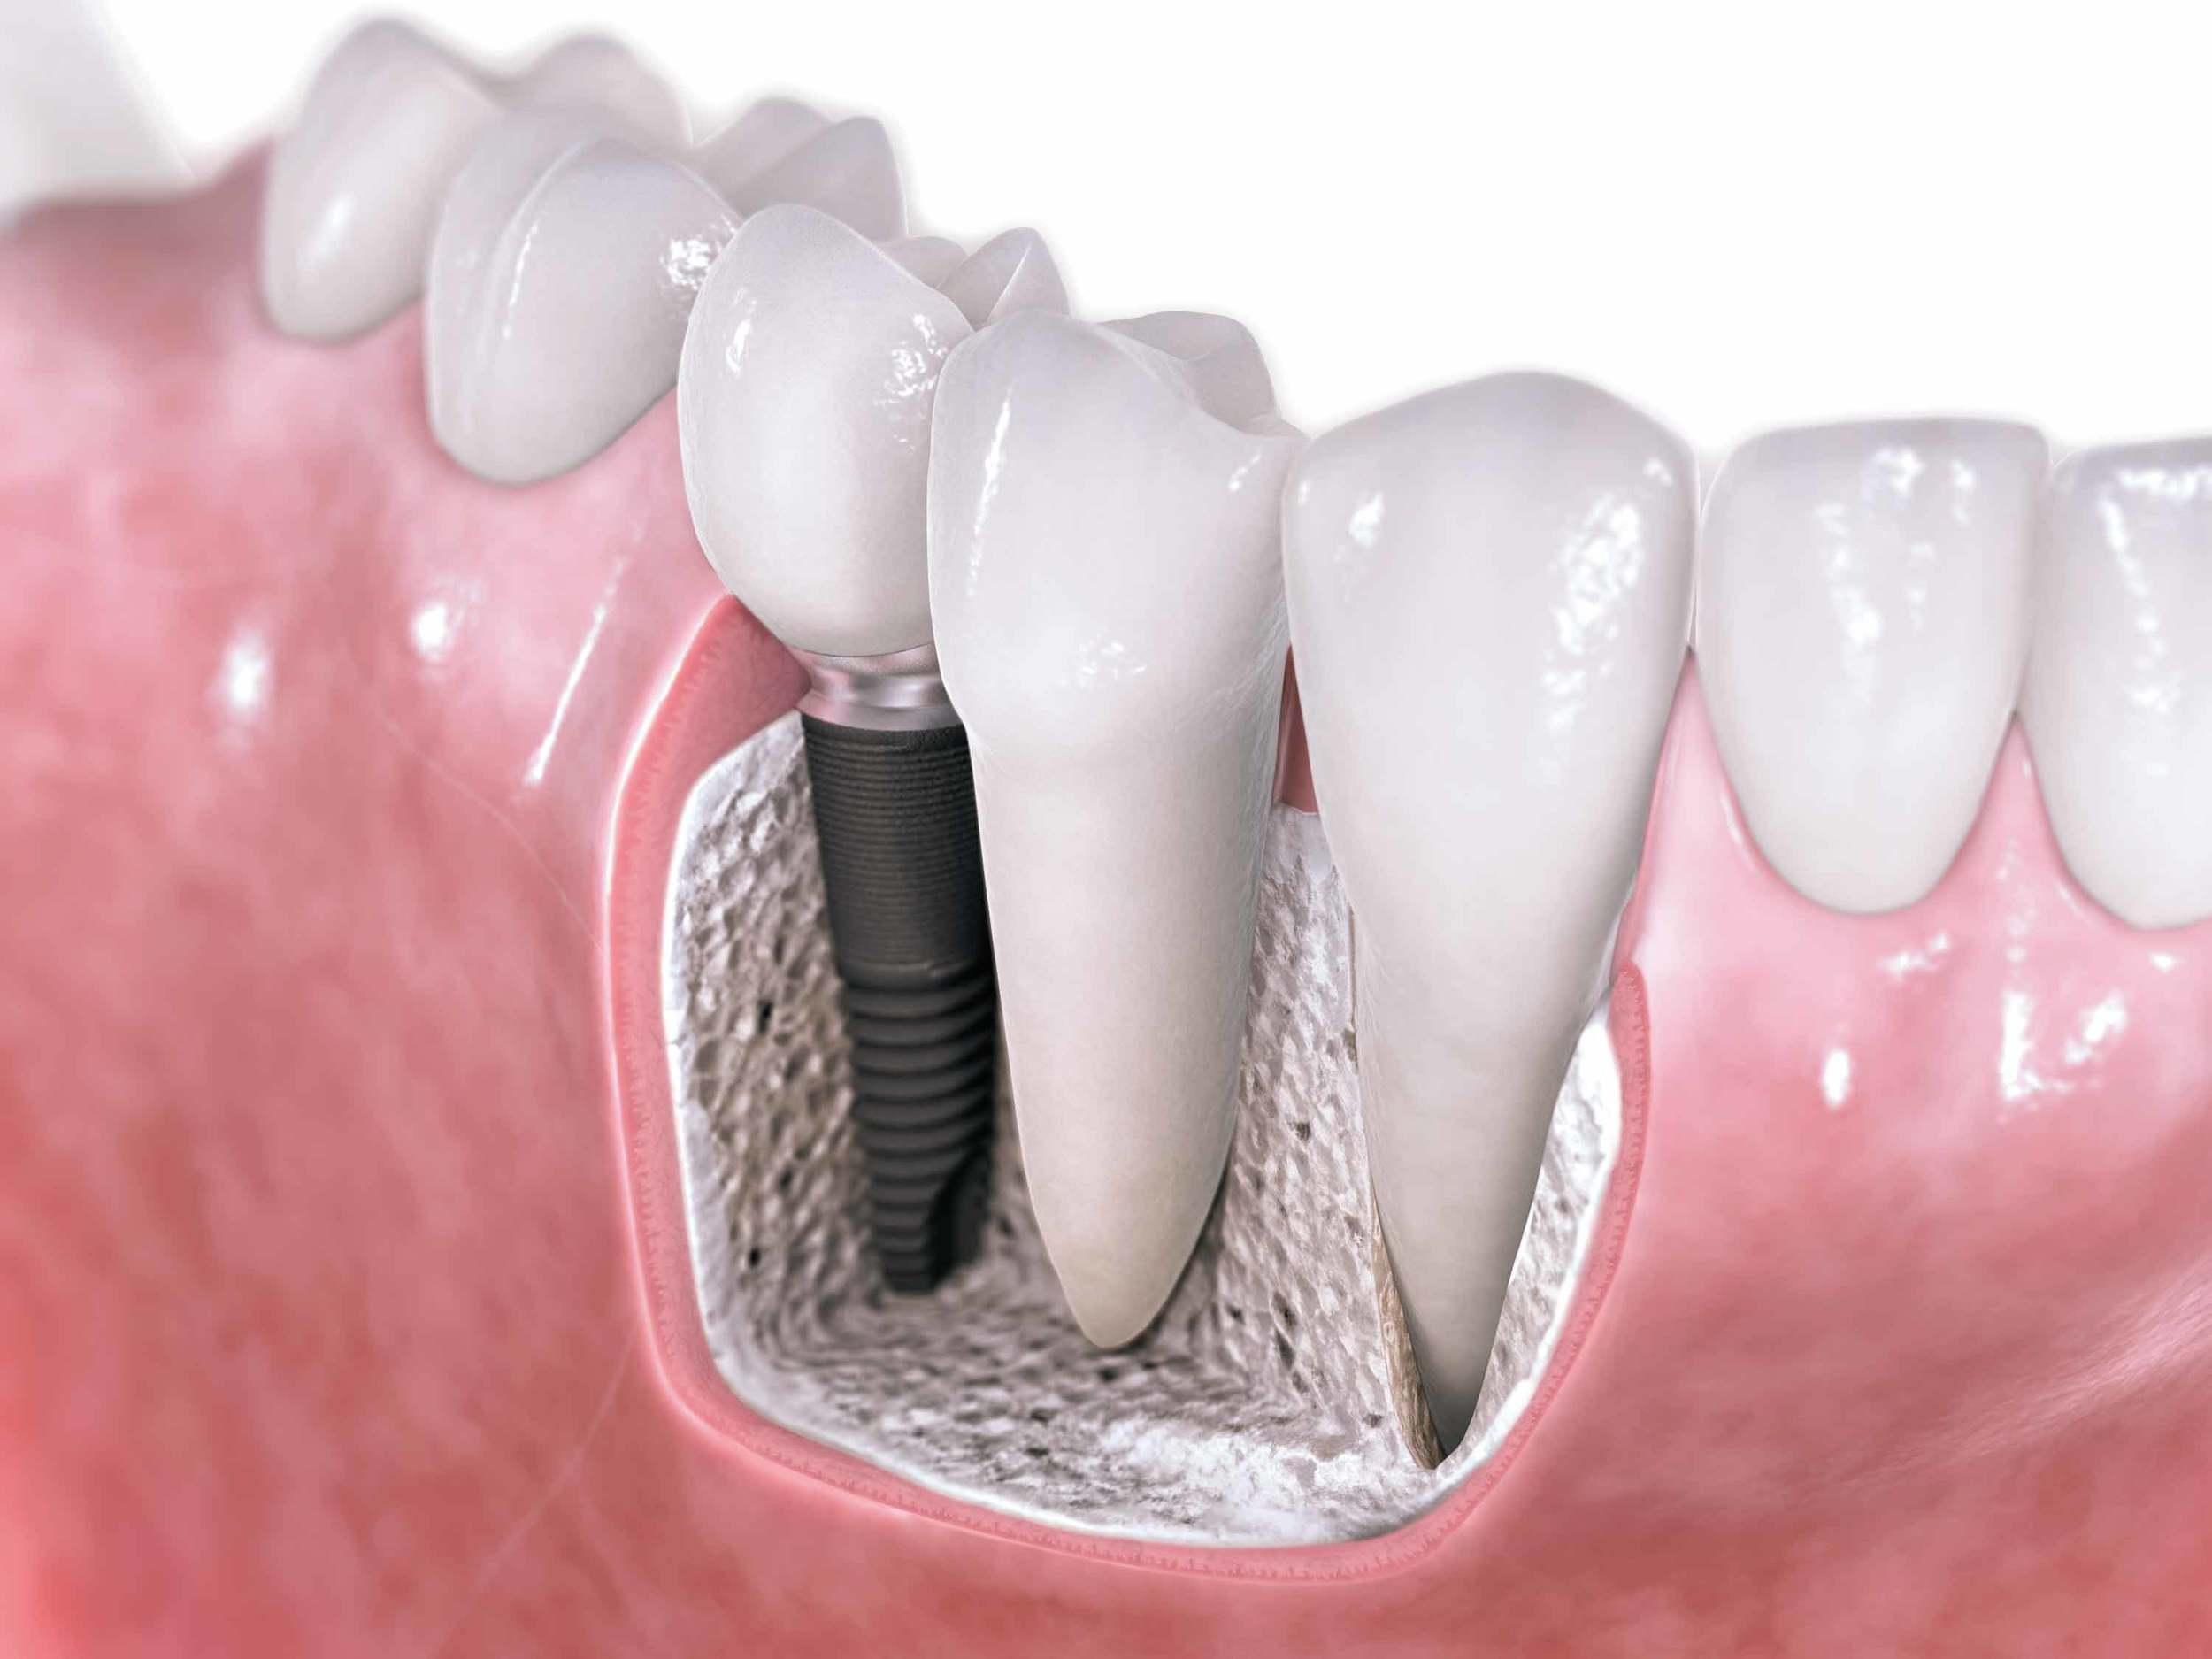 implant dentistry